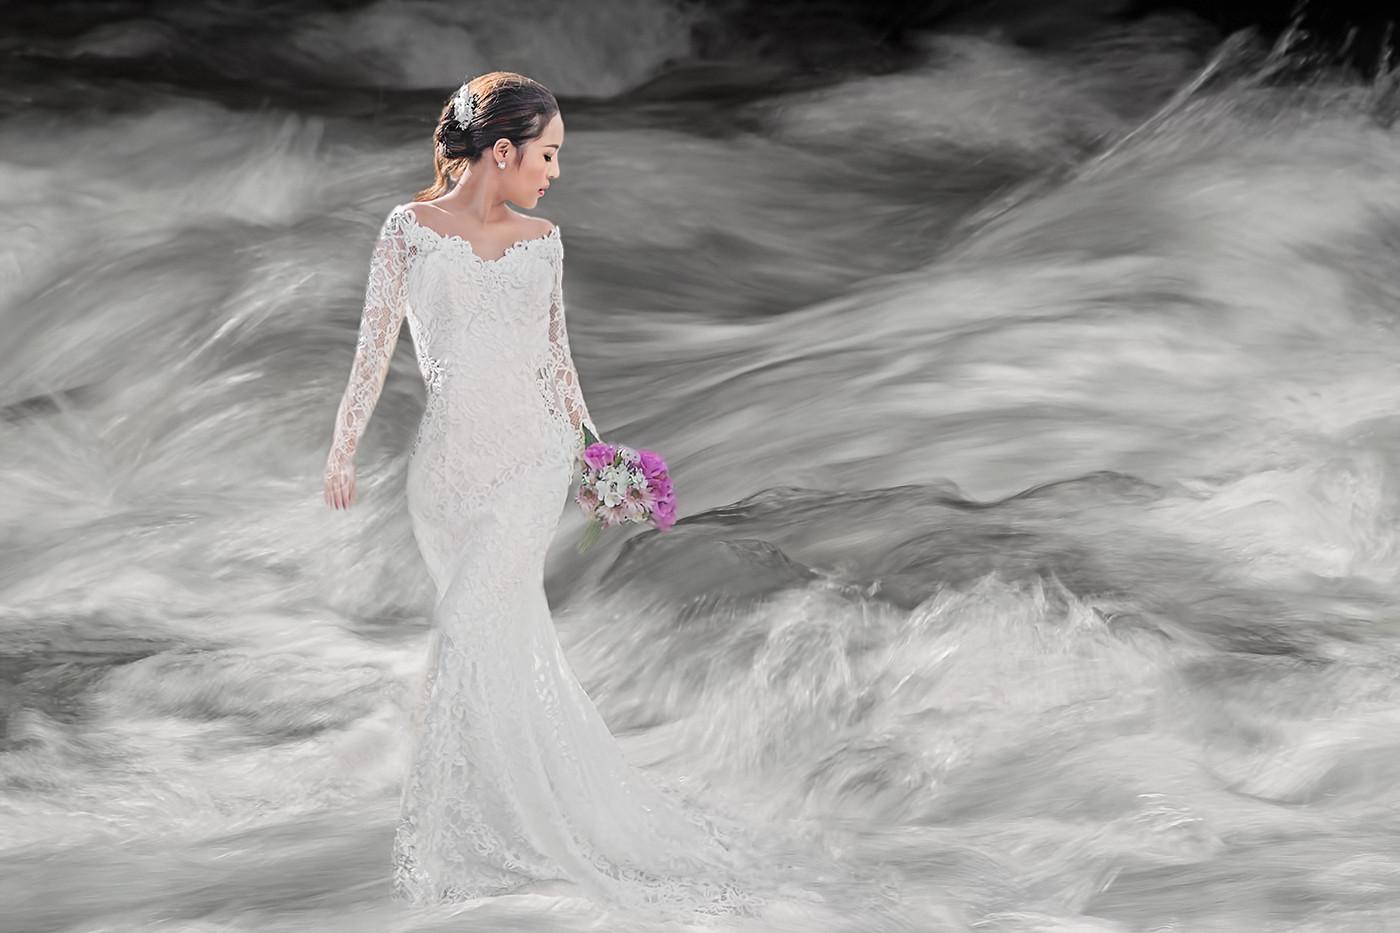 17 STORMY WATERS by Pam Sherren